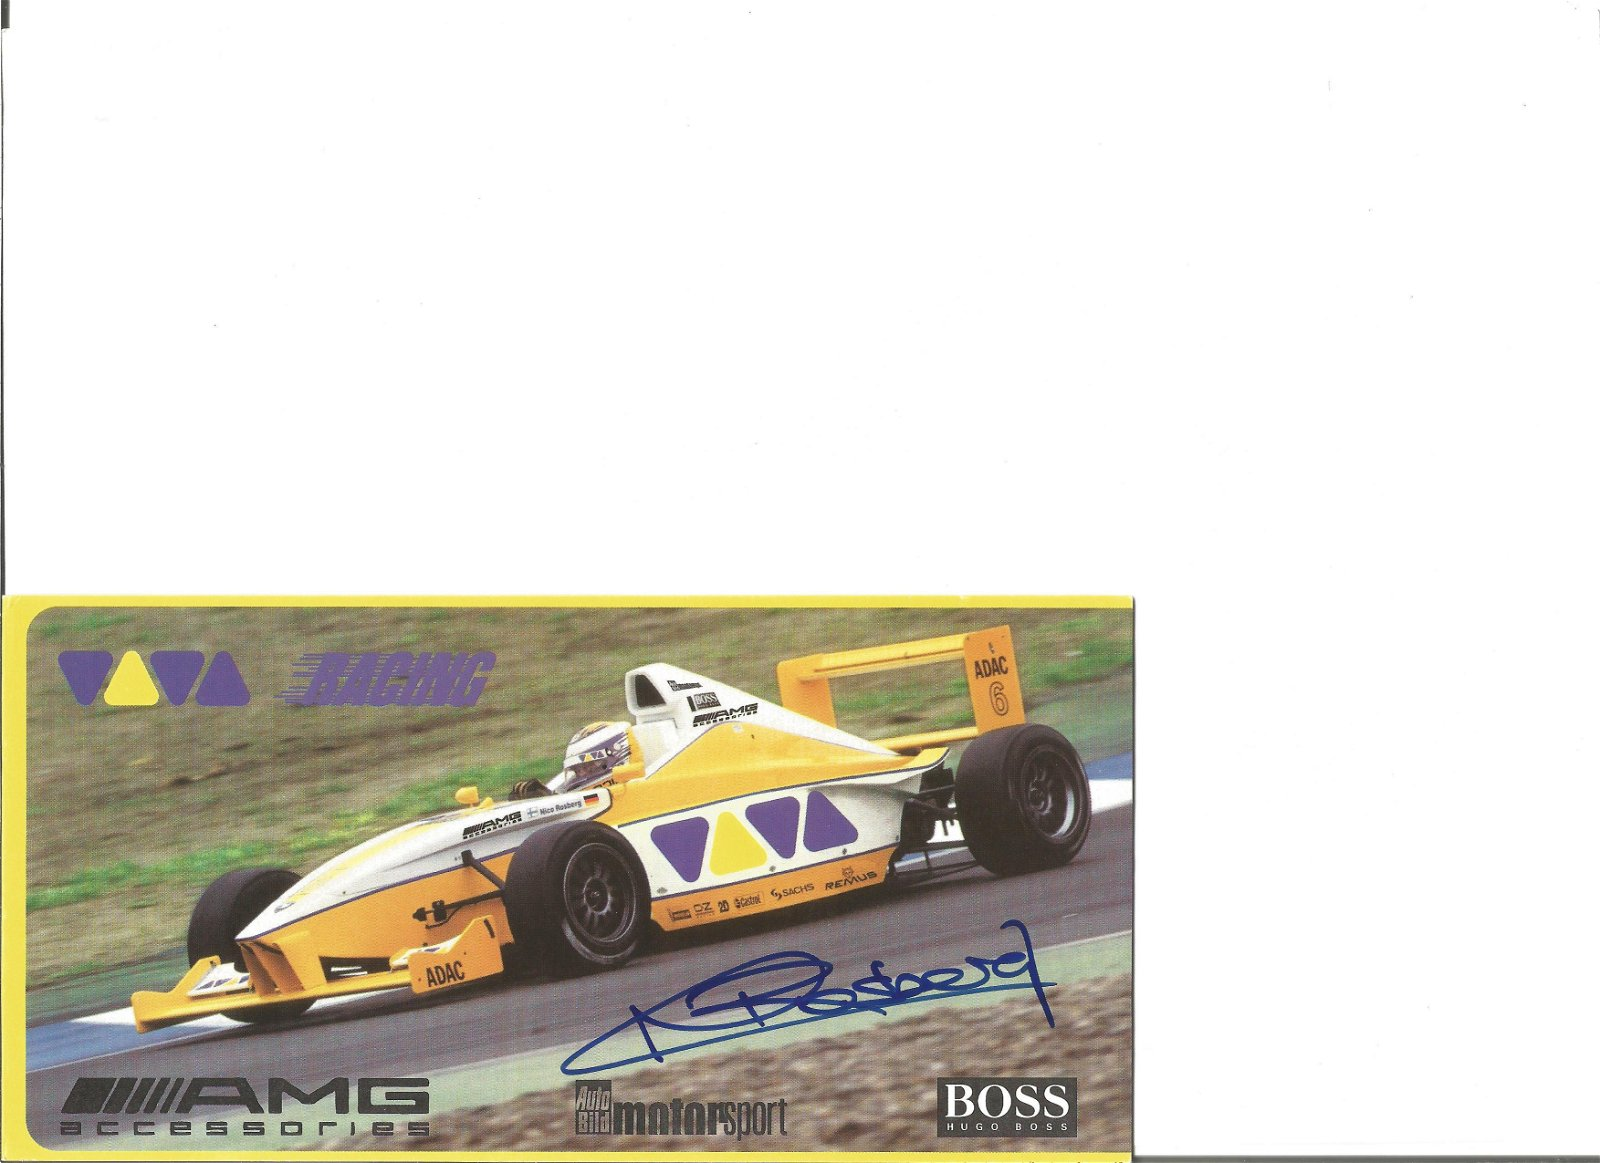 Ralf Schumacher signed colour 6x4 promotional postcard.